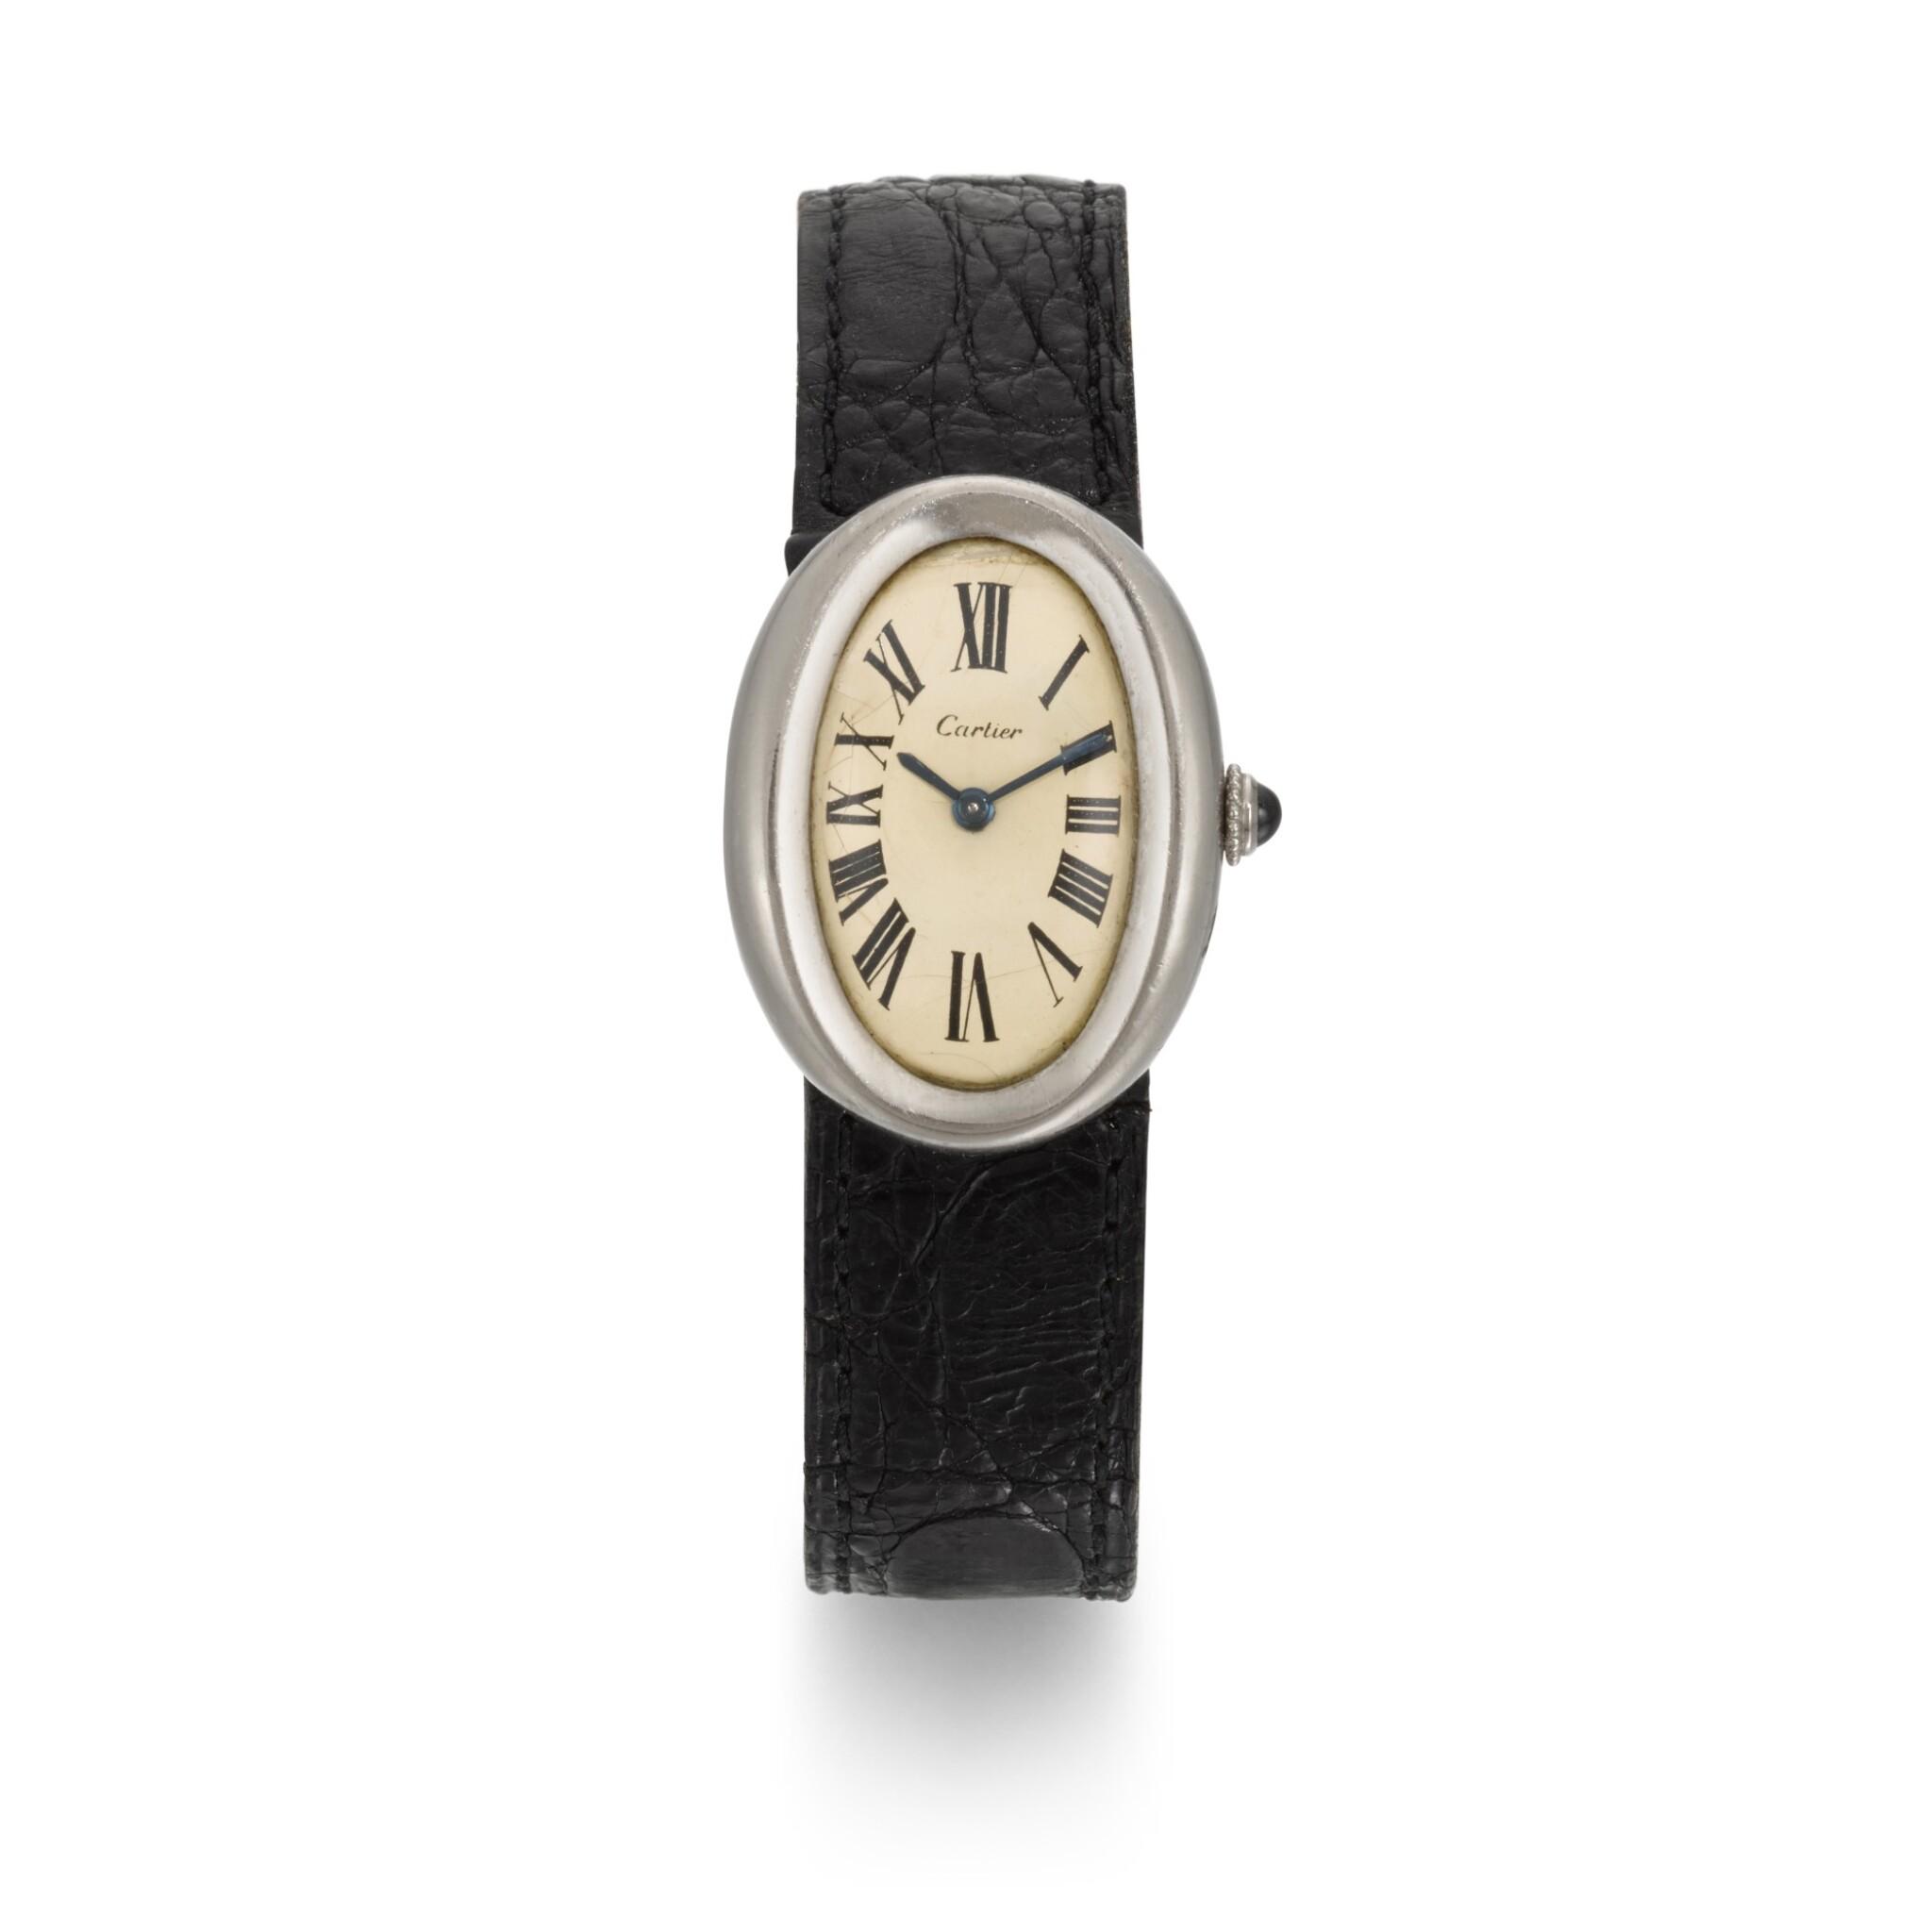 View full screen - View 1 of Lot 41. BRIAN EPSTEIN | Cartier wristwatch, 1966.